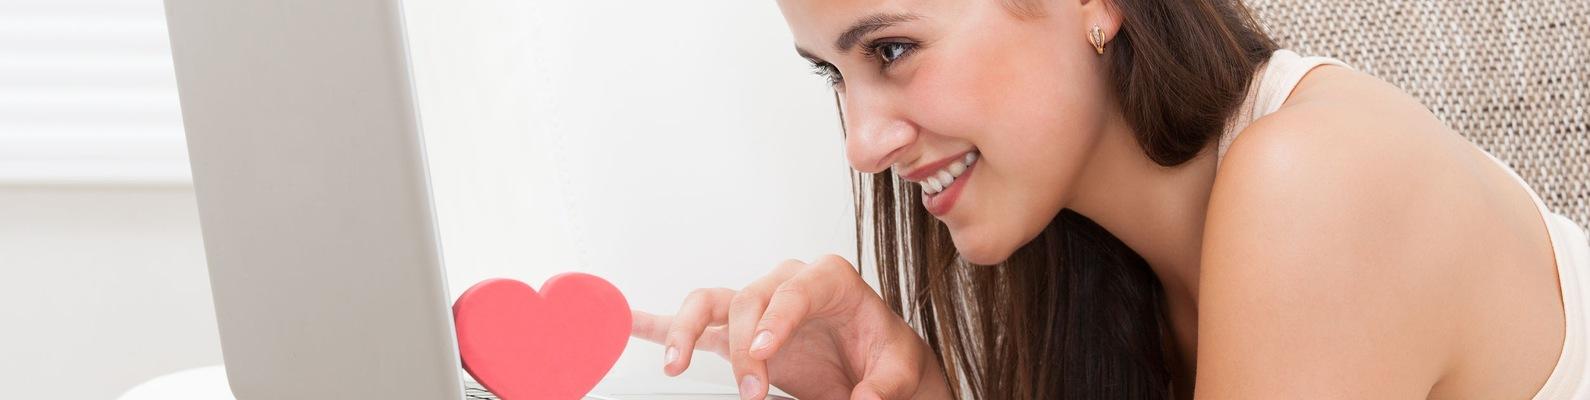 рулетка онлайн знакомства